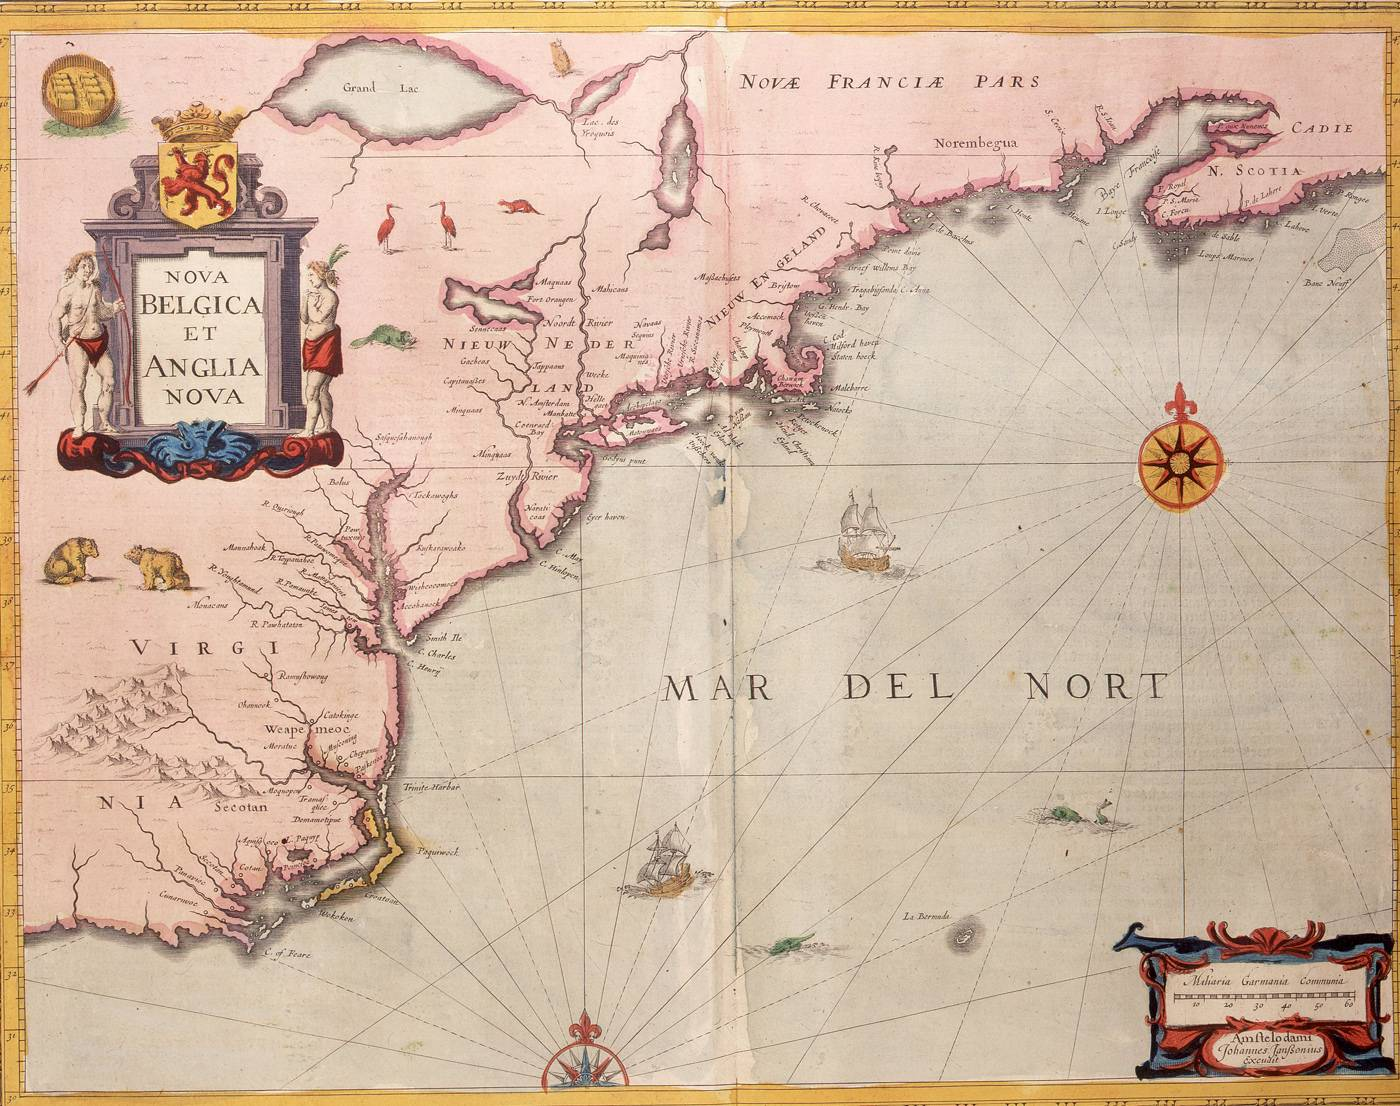 Jan Janssonius, 'Nova Belgica et Anglia Nova', 1647